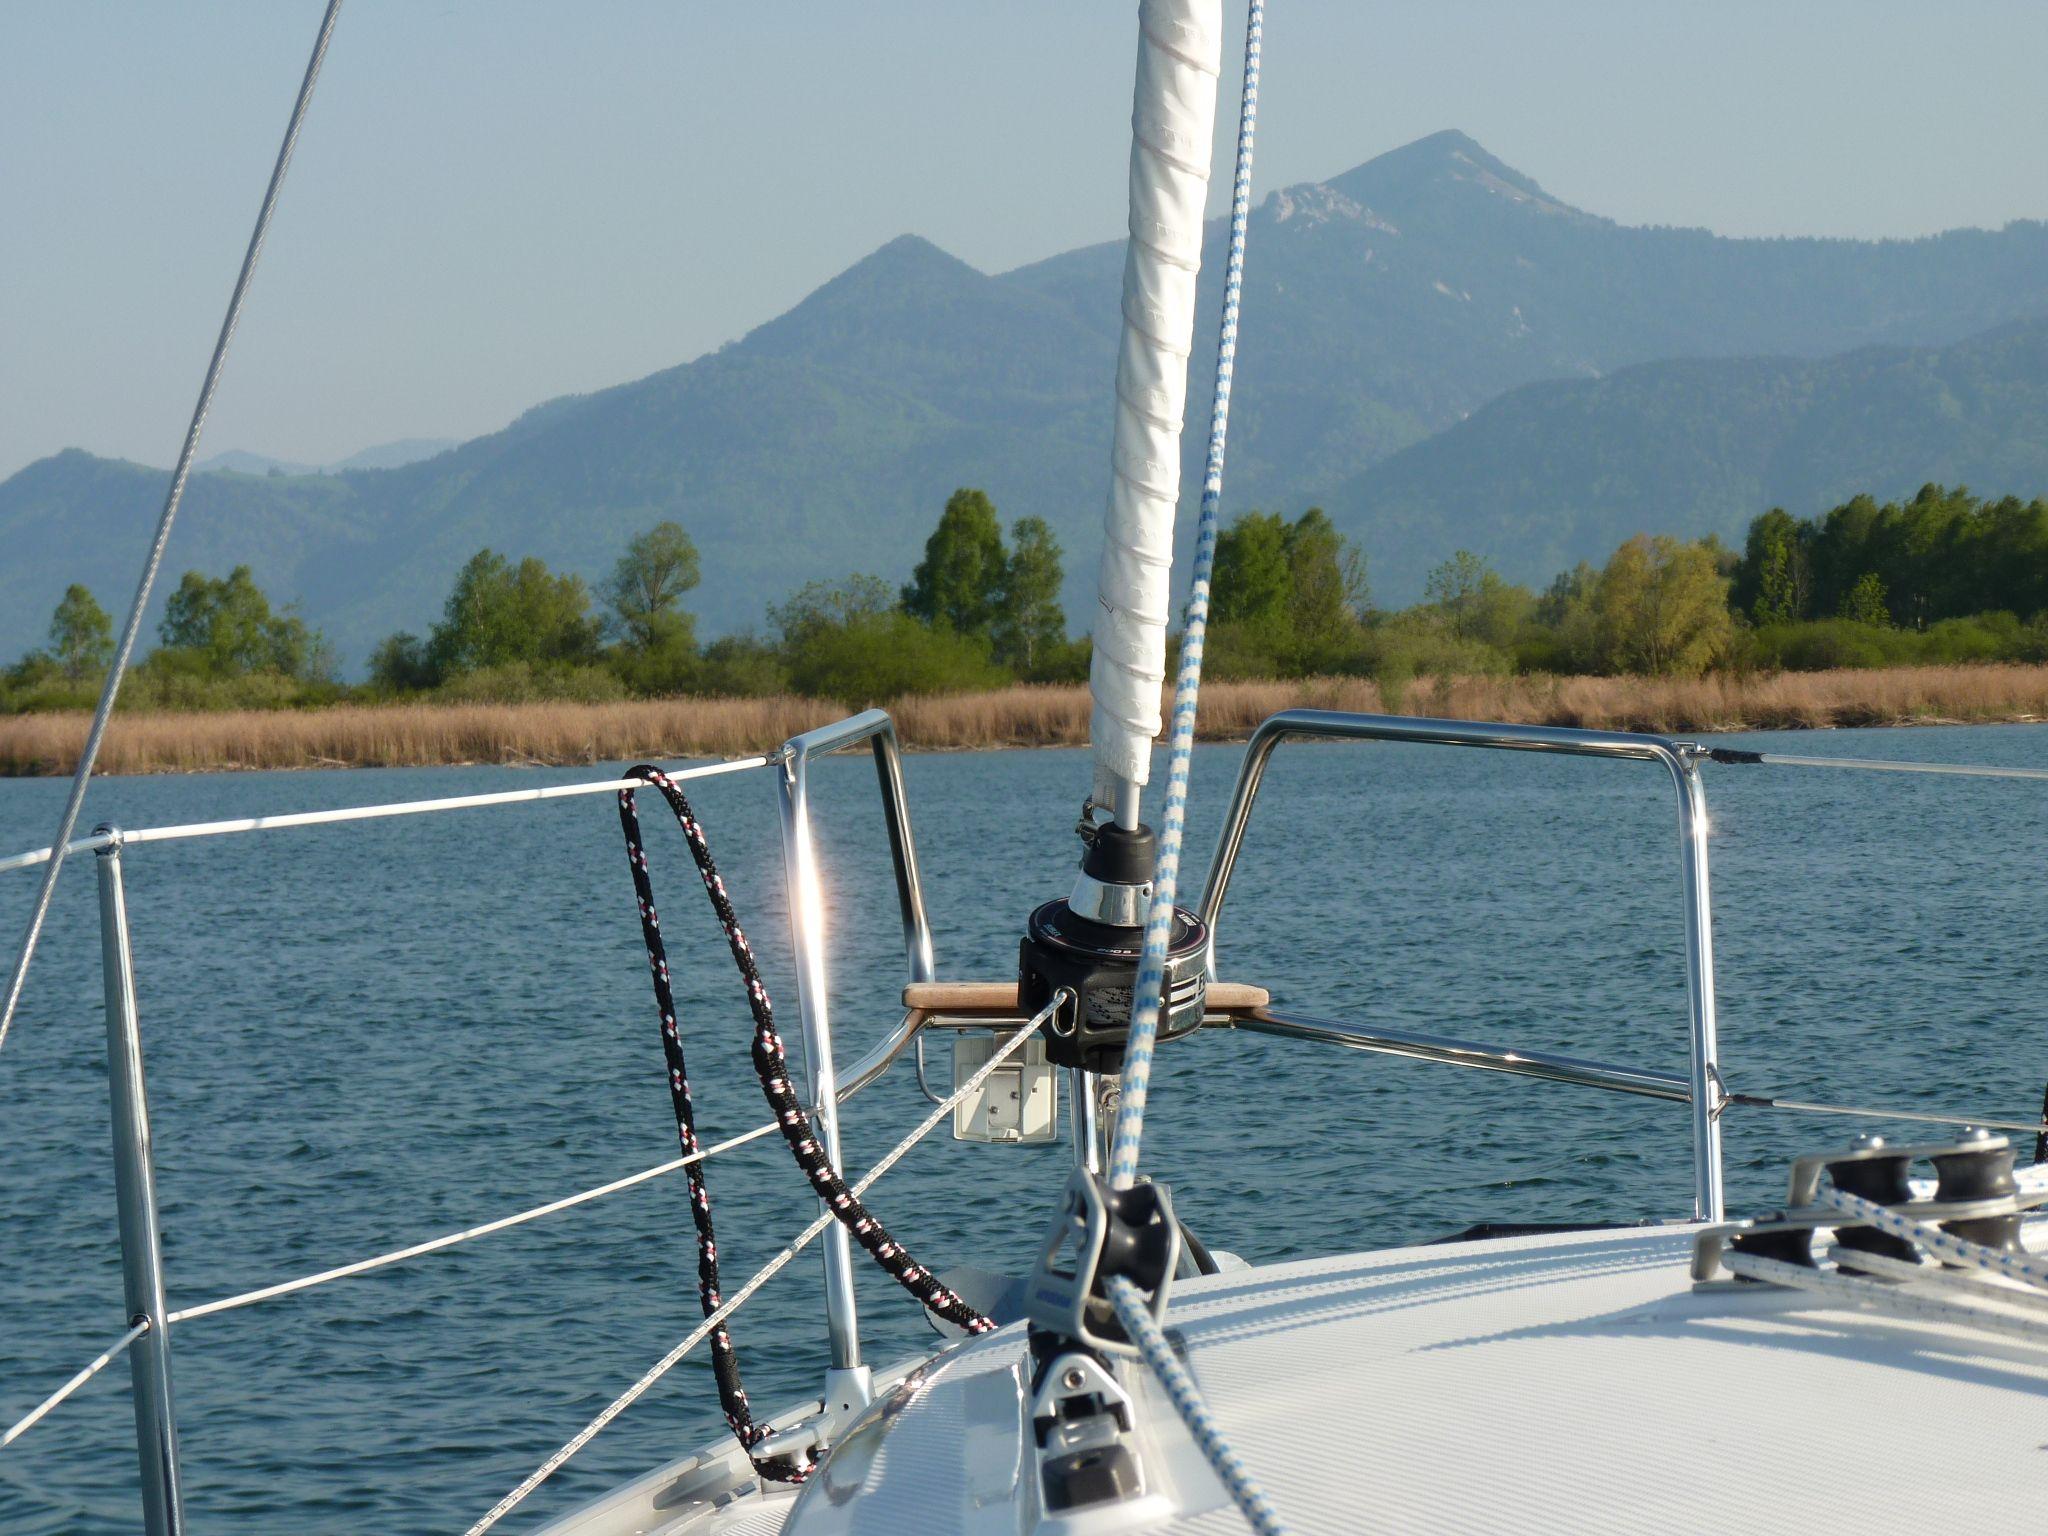 #Segeln am #Chiemsee - Firmenregatta - #Segelevent - #sail #sailing #bavaria #germany #see #segelboot #boot